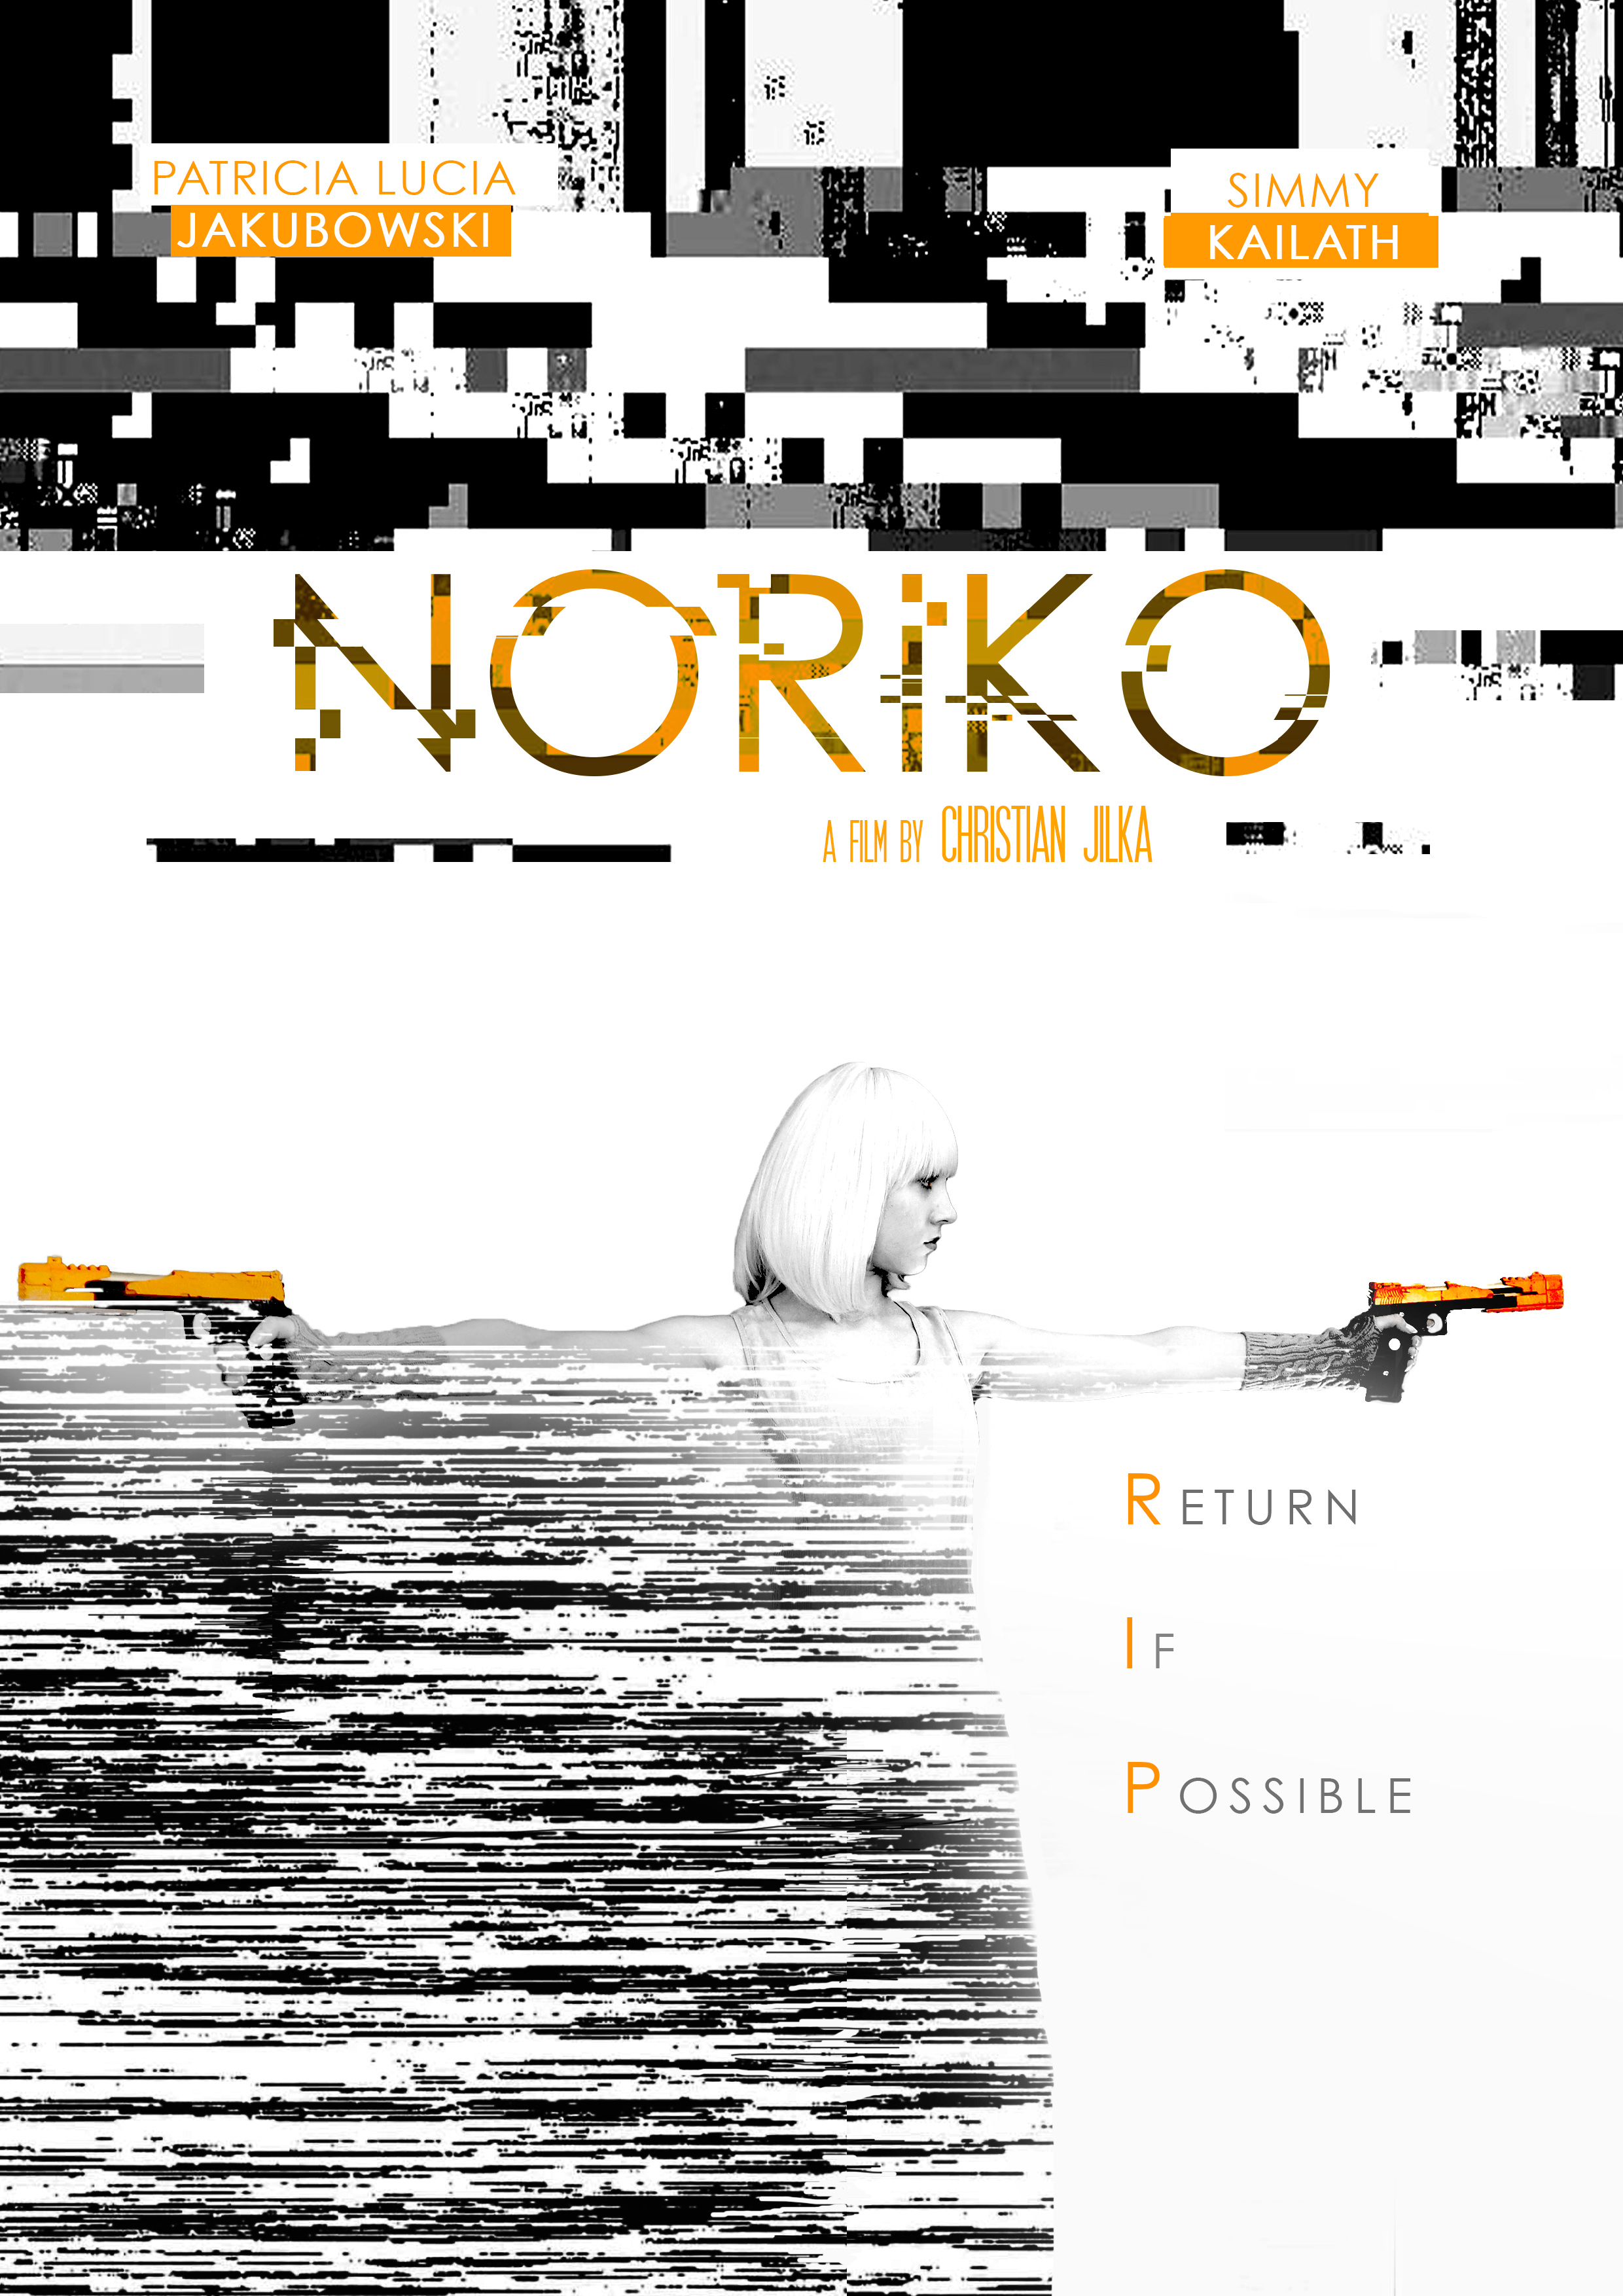 Noriko Poster 3.jpg